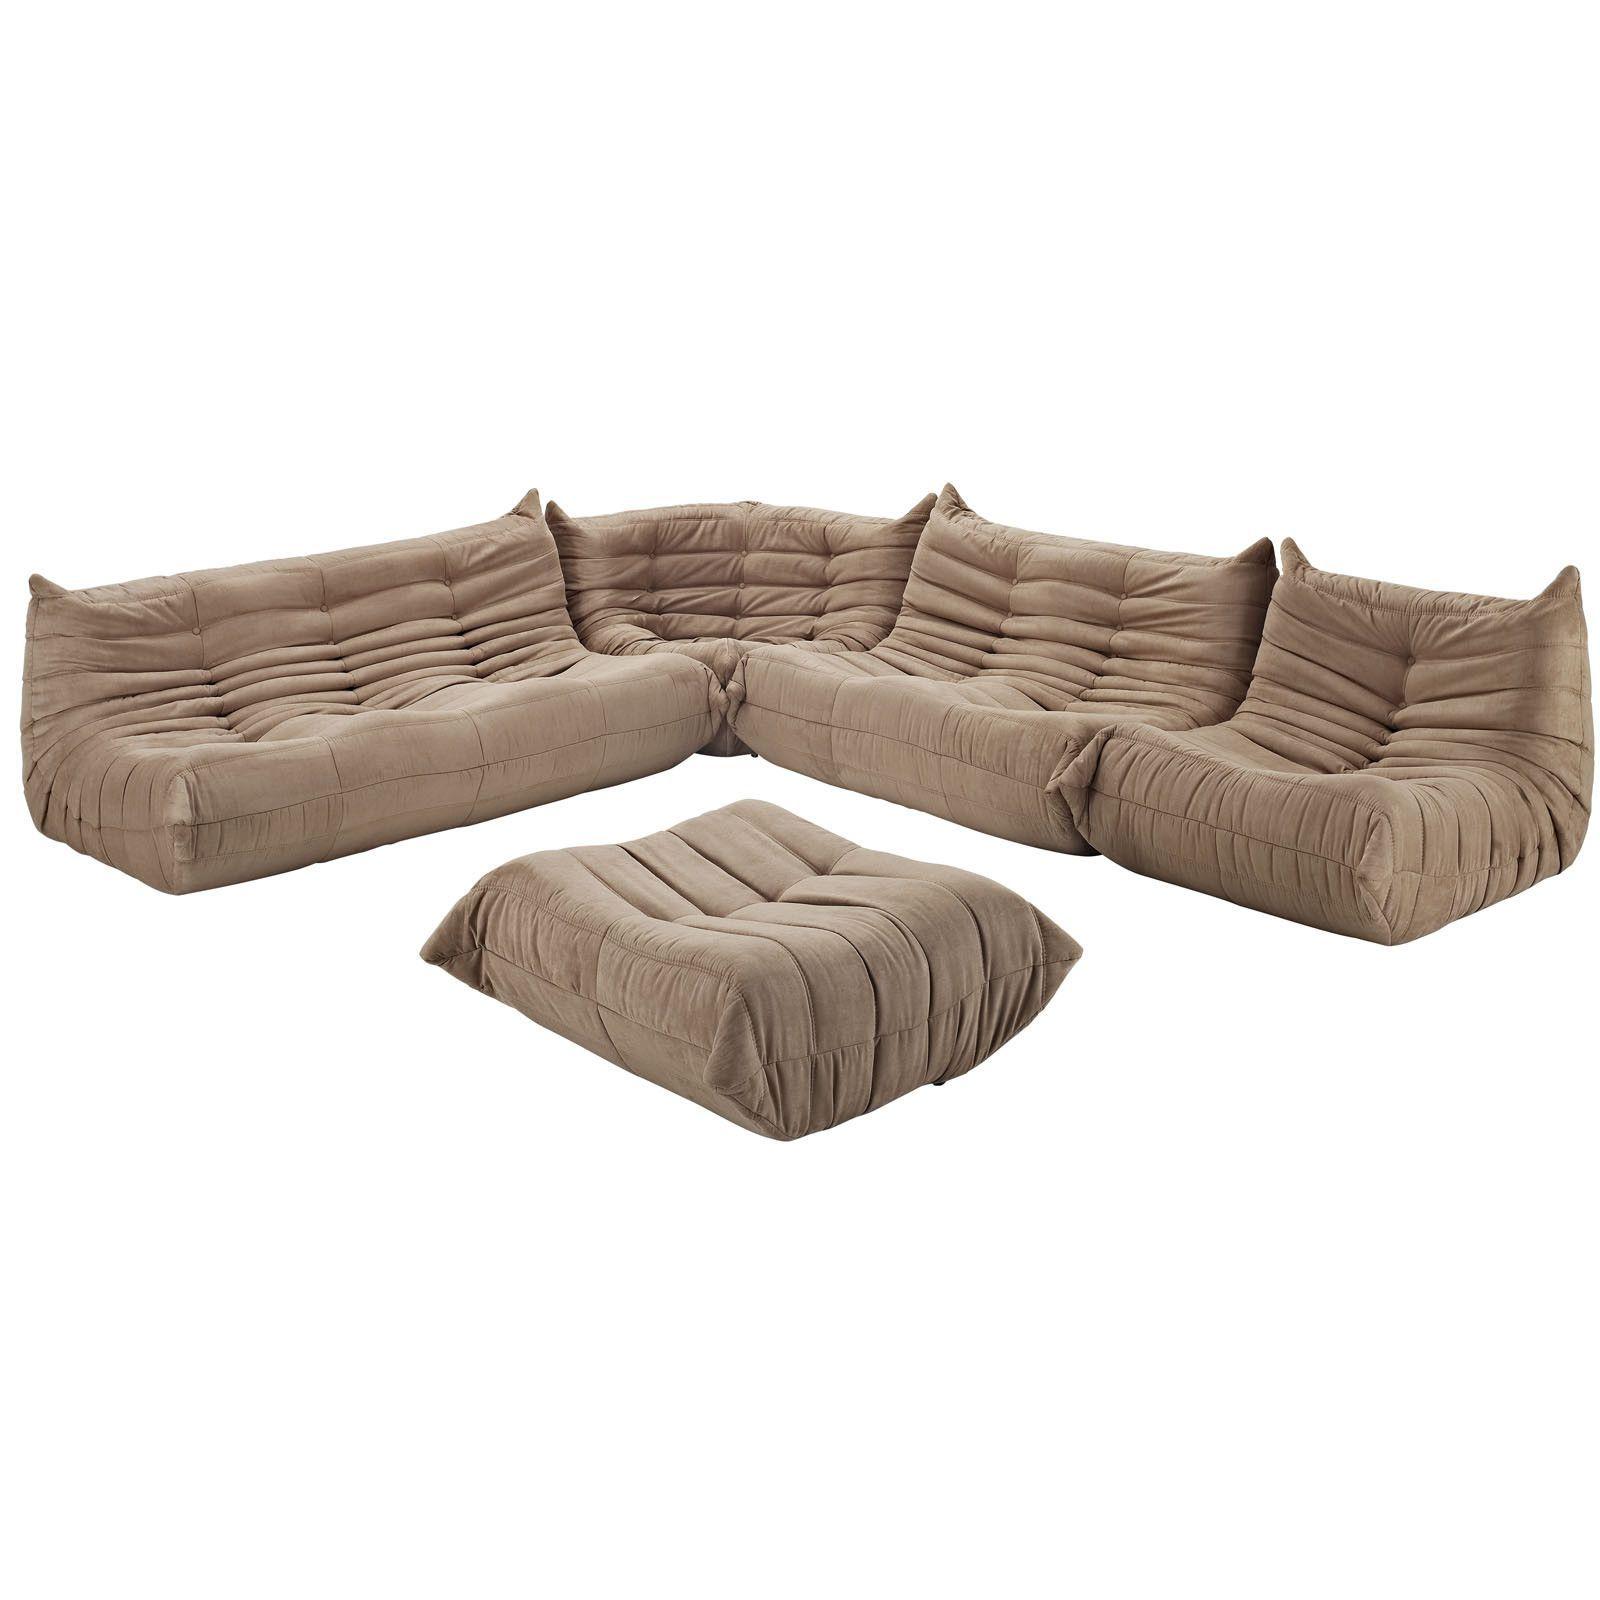 Waverunner Memory Foam Sectional Sofa